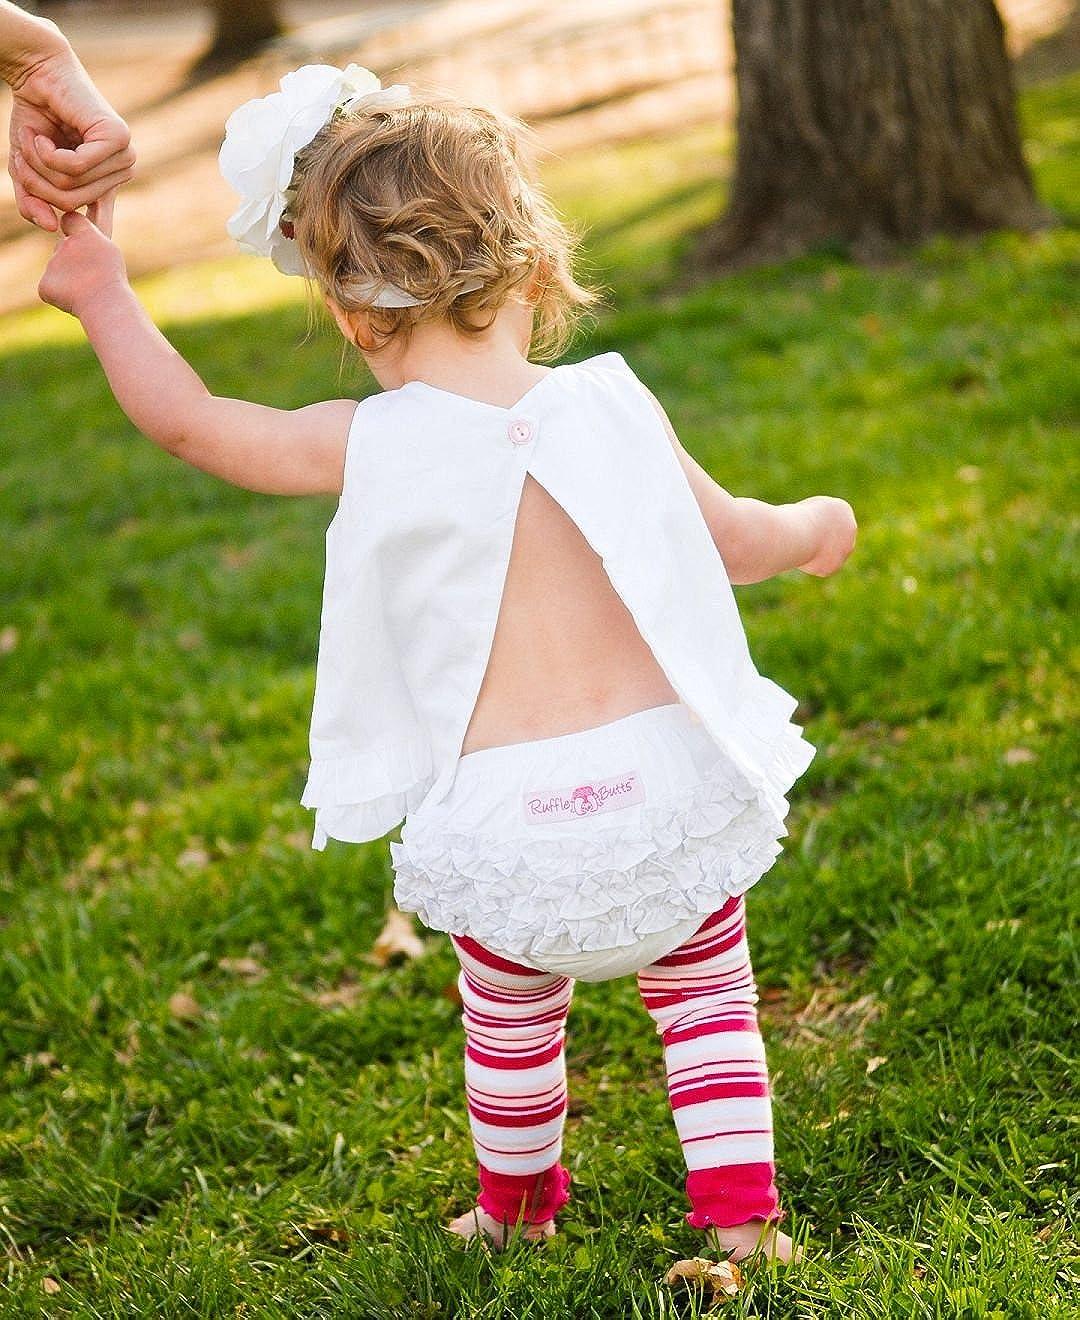 Baby girl rufflebutts rompers onesies